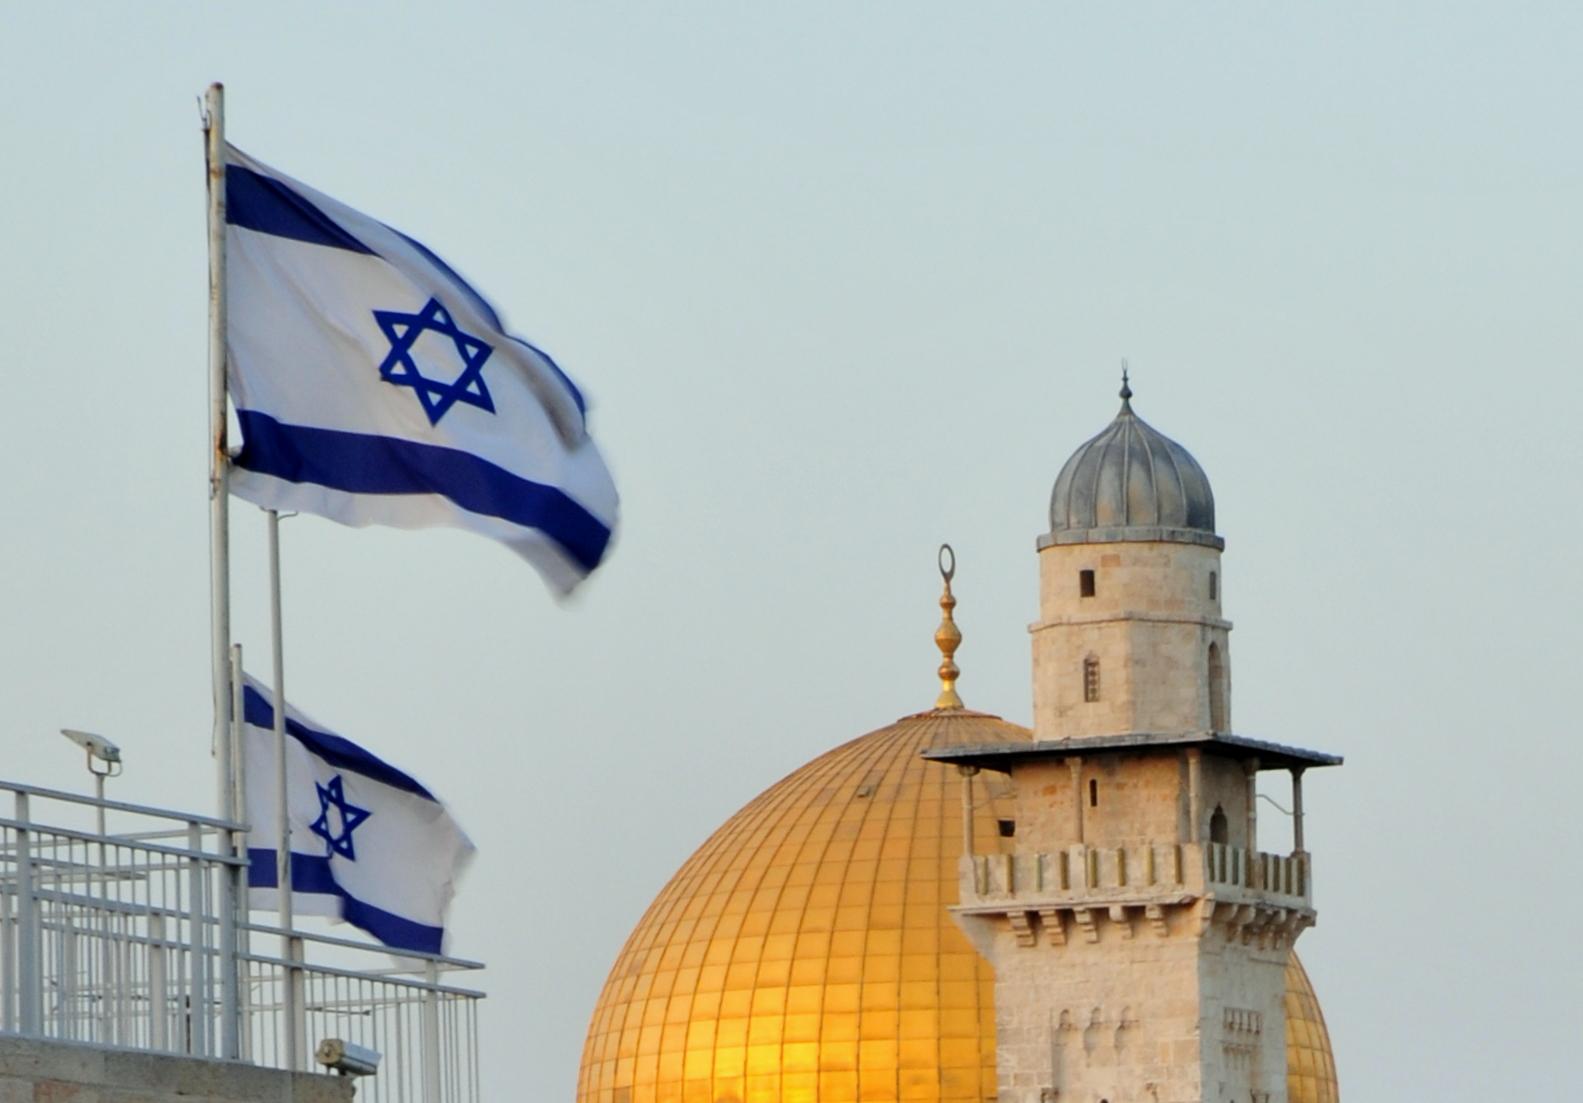 Israeli flags and Muslim minarets in Jerusalem's Old City. Photo: Dave Bender